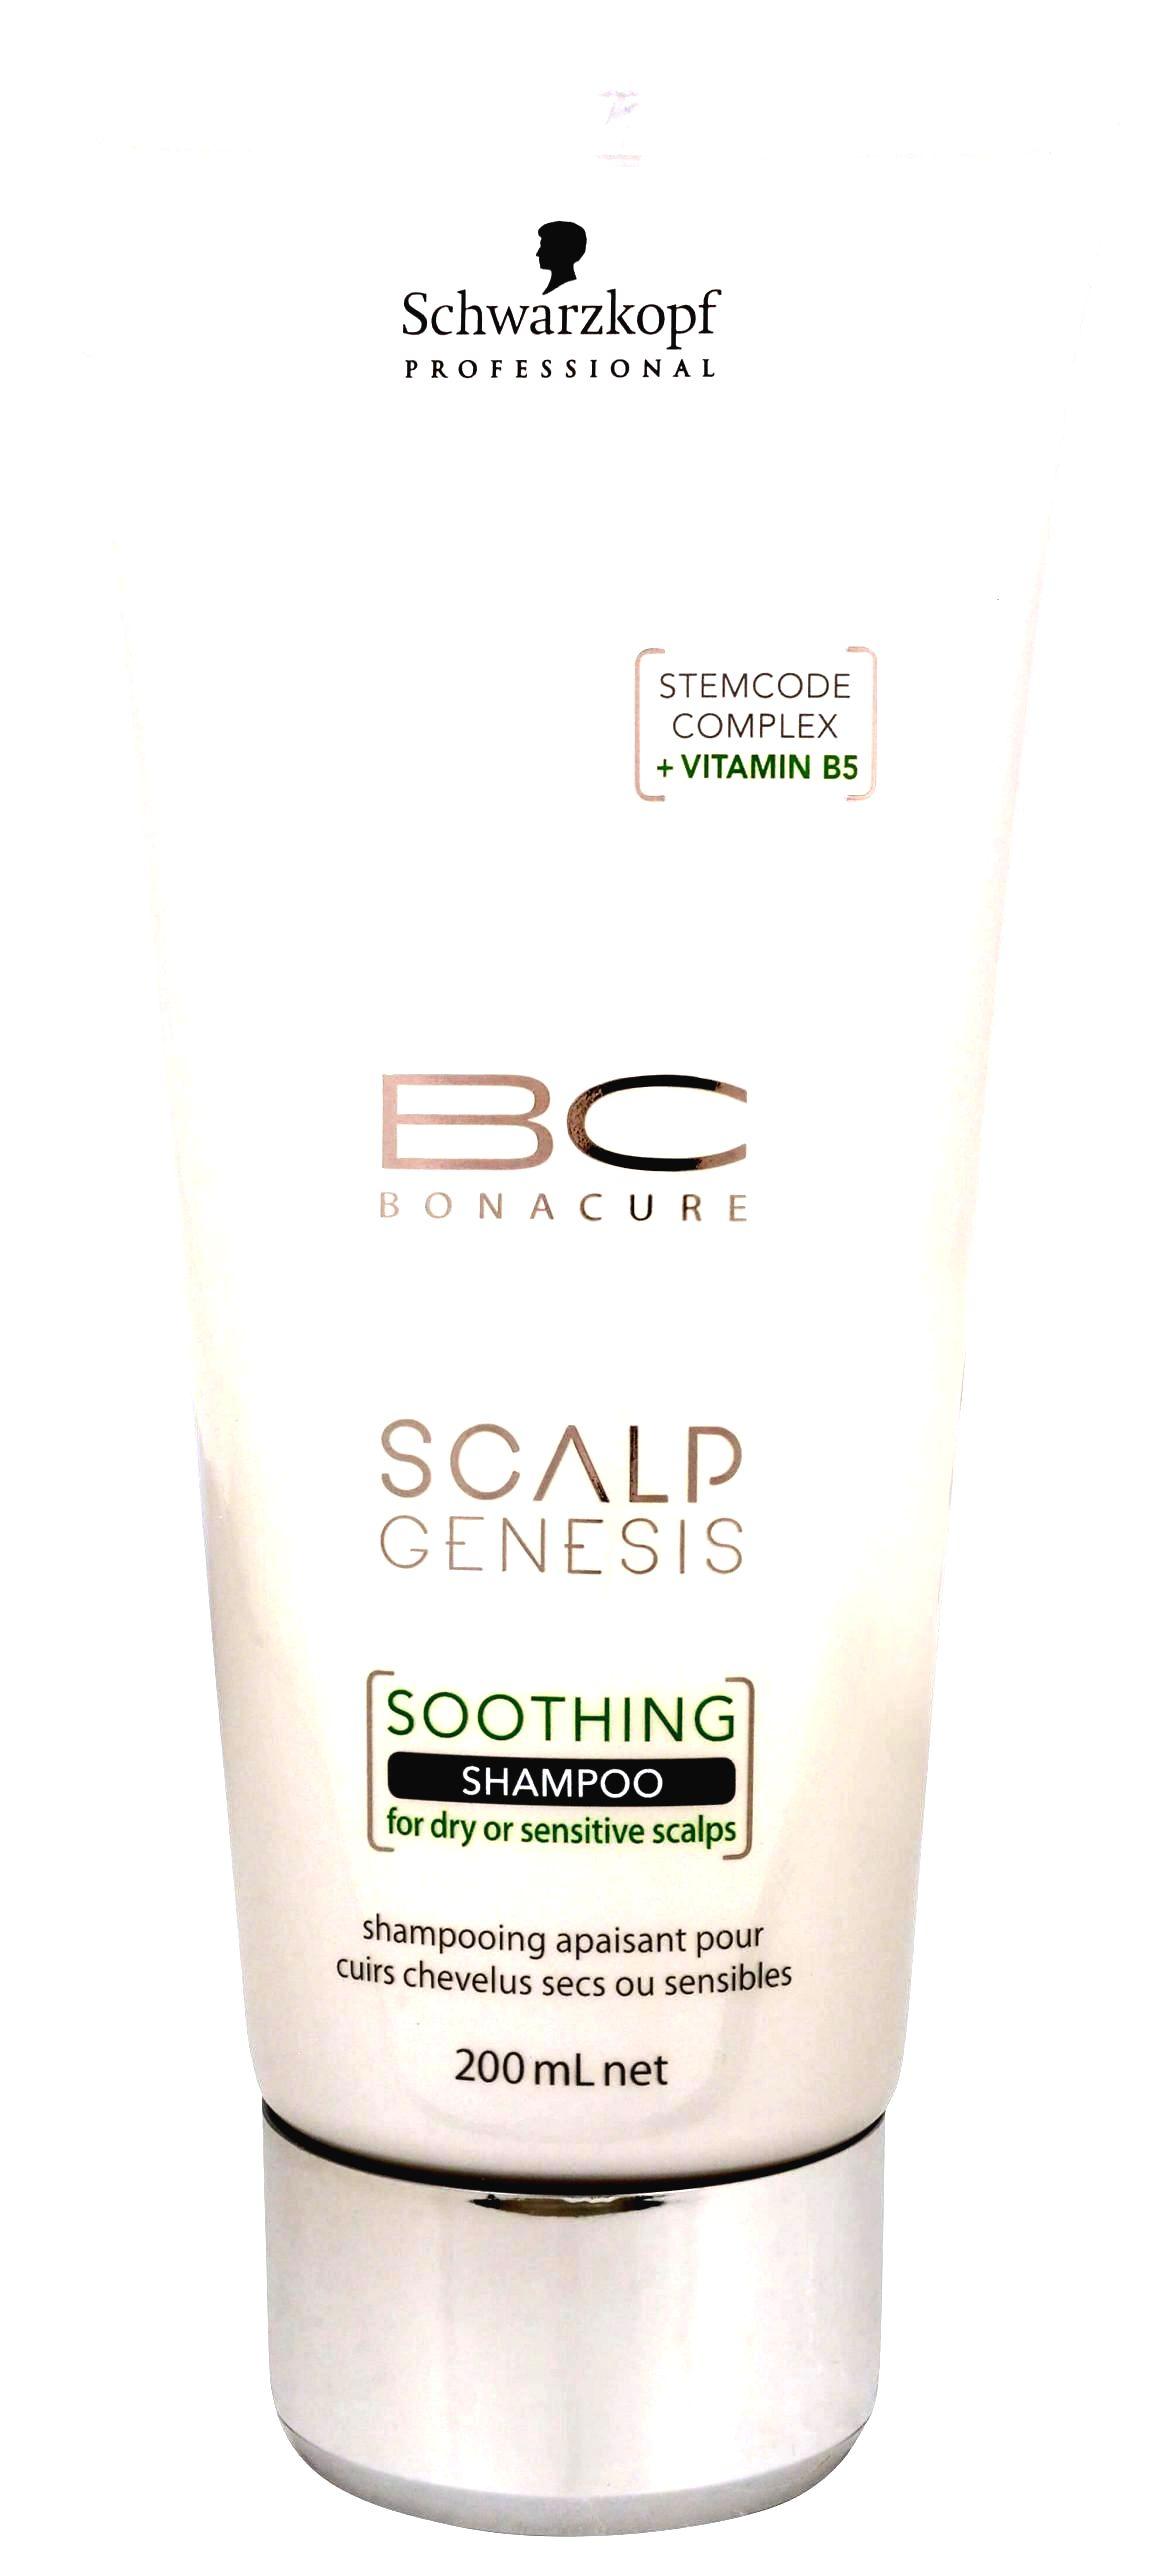 Schwarzkopf Professional Upokojujúci šampón pre suchú a citlivú vlasovú pokožku BC Bonacure Scalp Genesis (Soothing Shampoo)200 ml